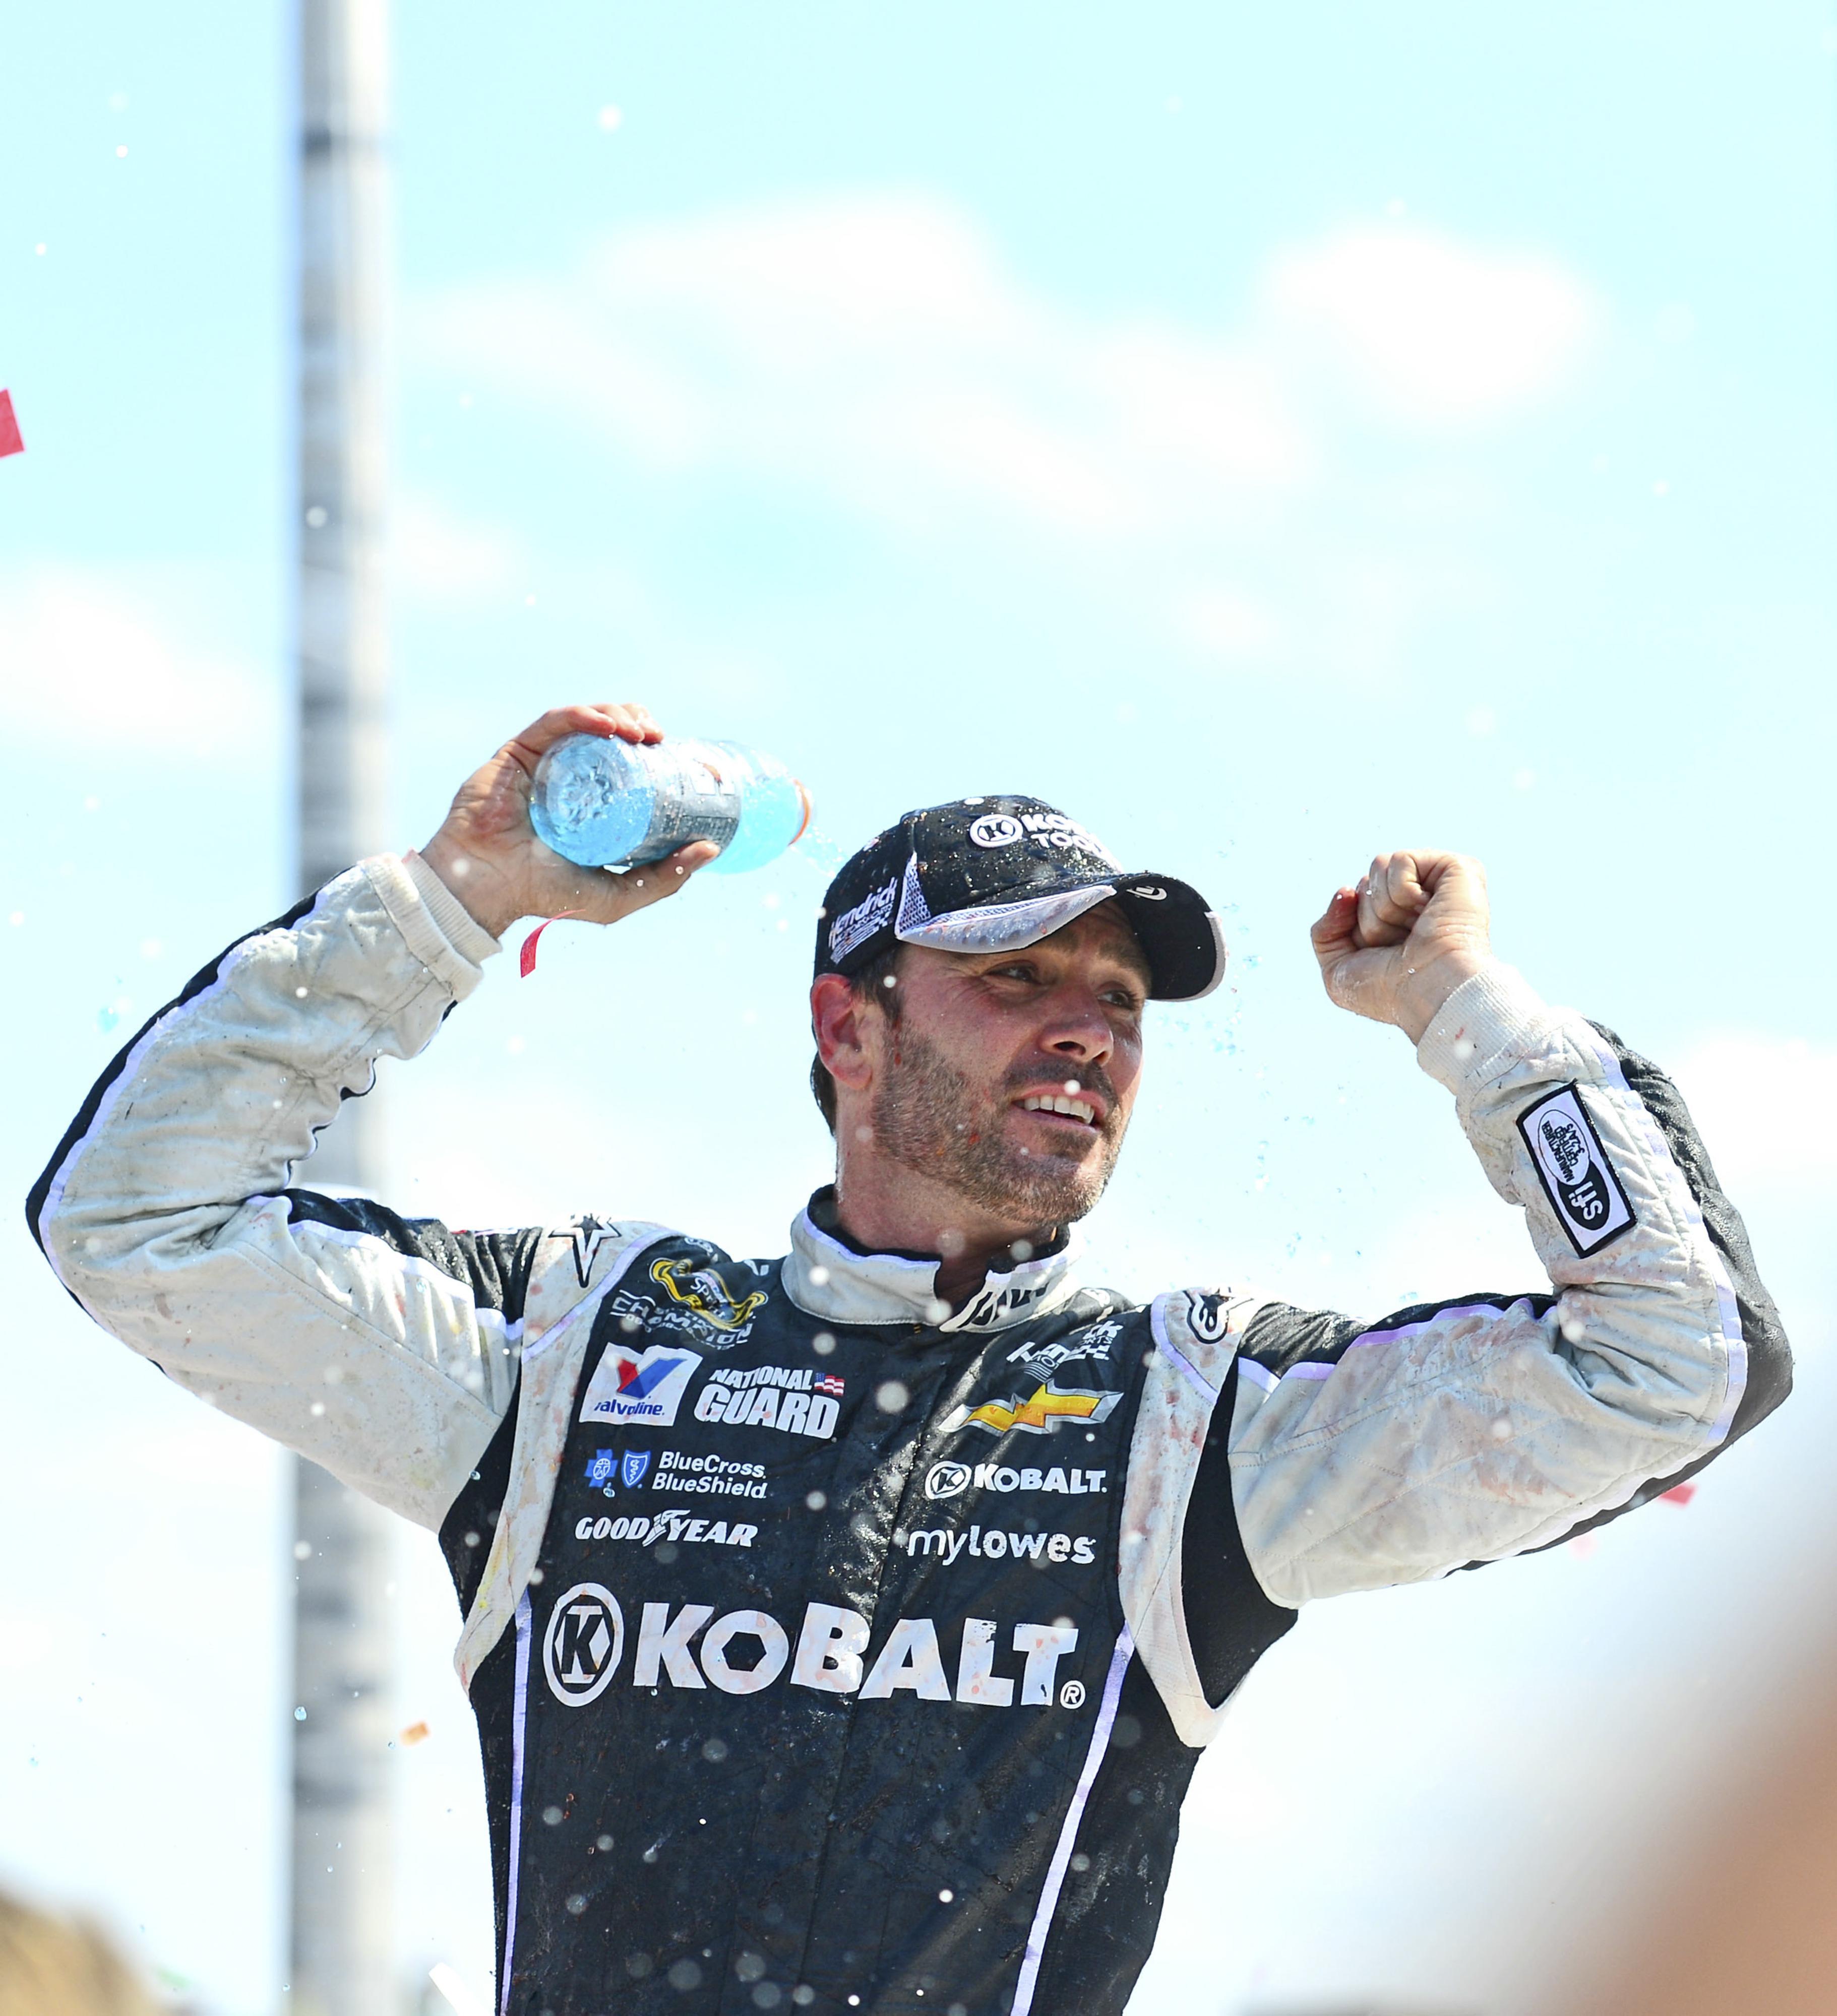 Jimmie Johnson wins the 2014 Quicken Loans 400 at Michigan International Speedway